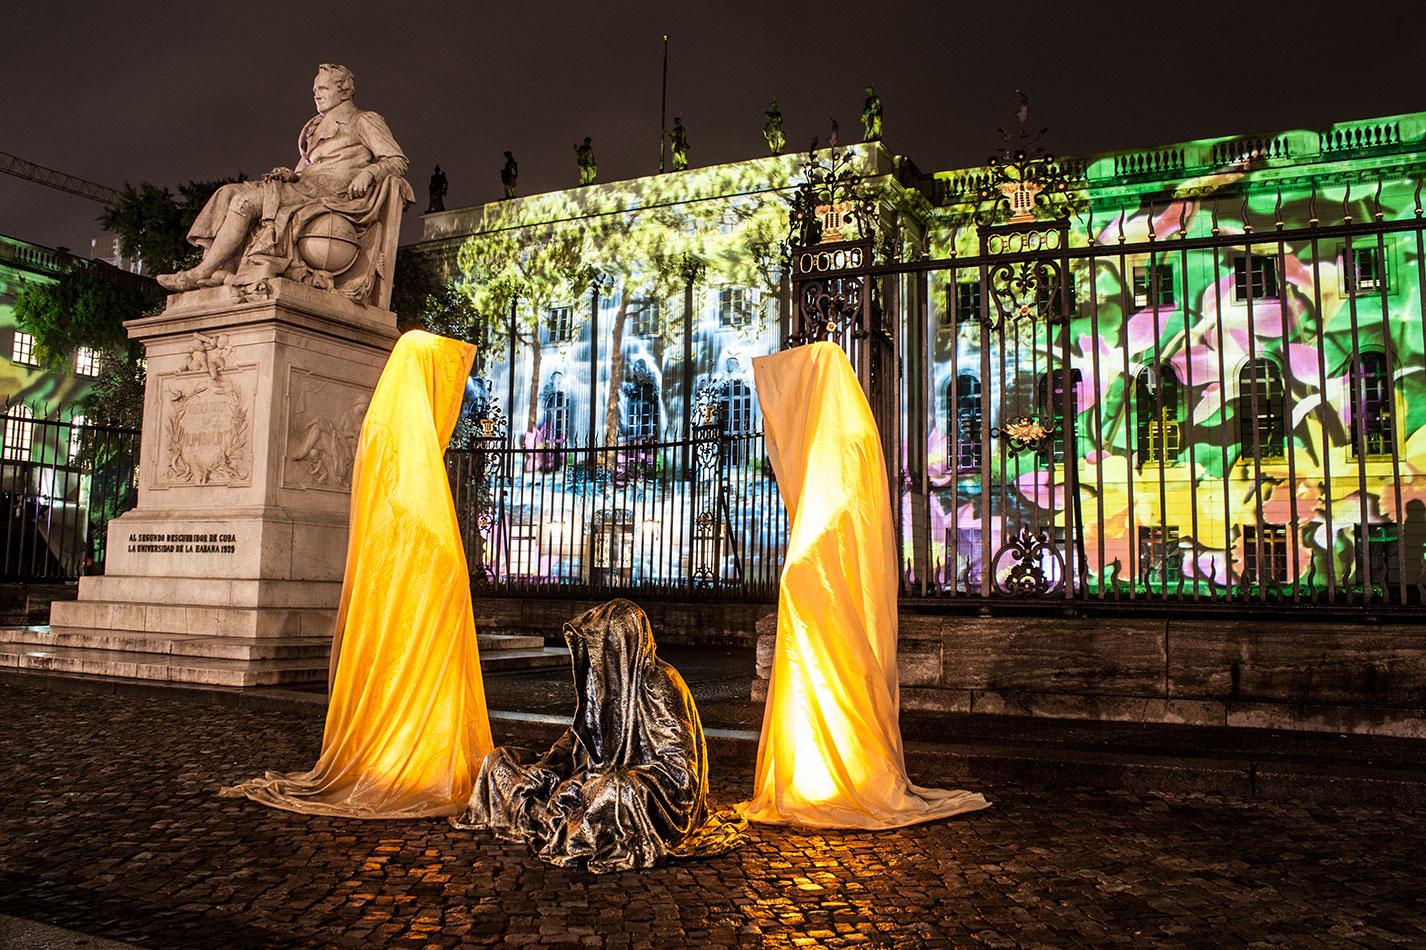 festival-of-lights-berlin-humbold-university-light-art-festival-contemporary-fine-art-design-show-guardiansof-time-manfred-kili-kielnhofer-sculpture-3584